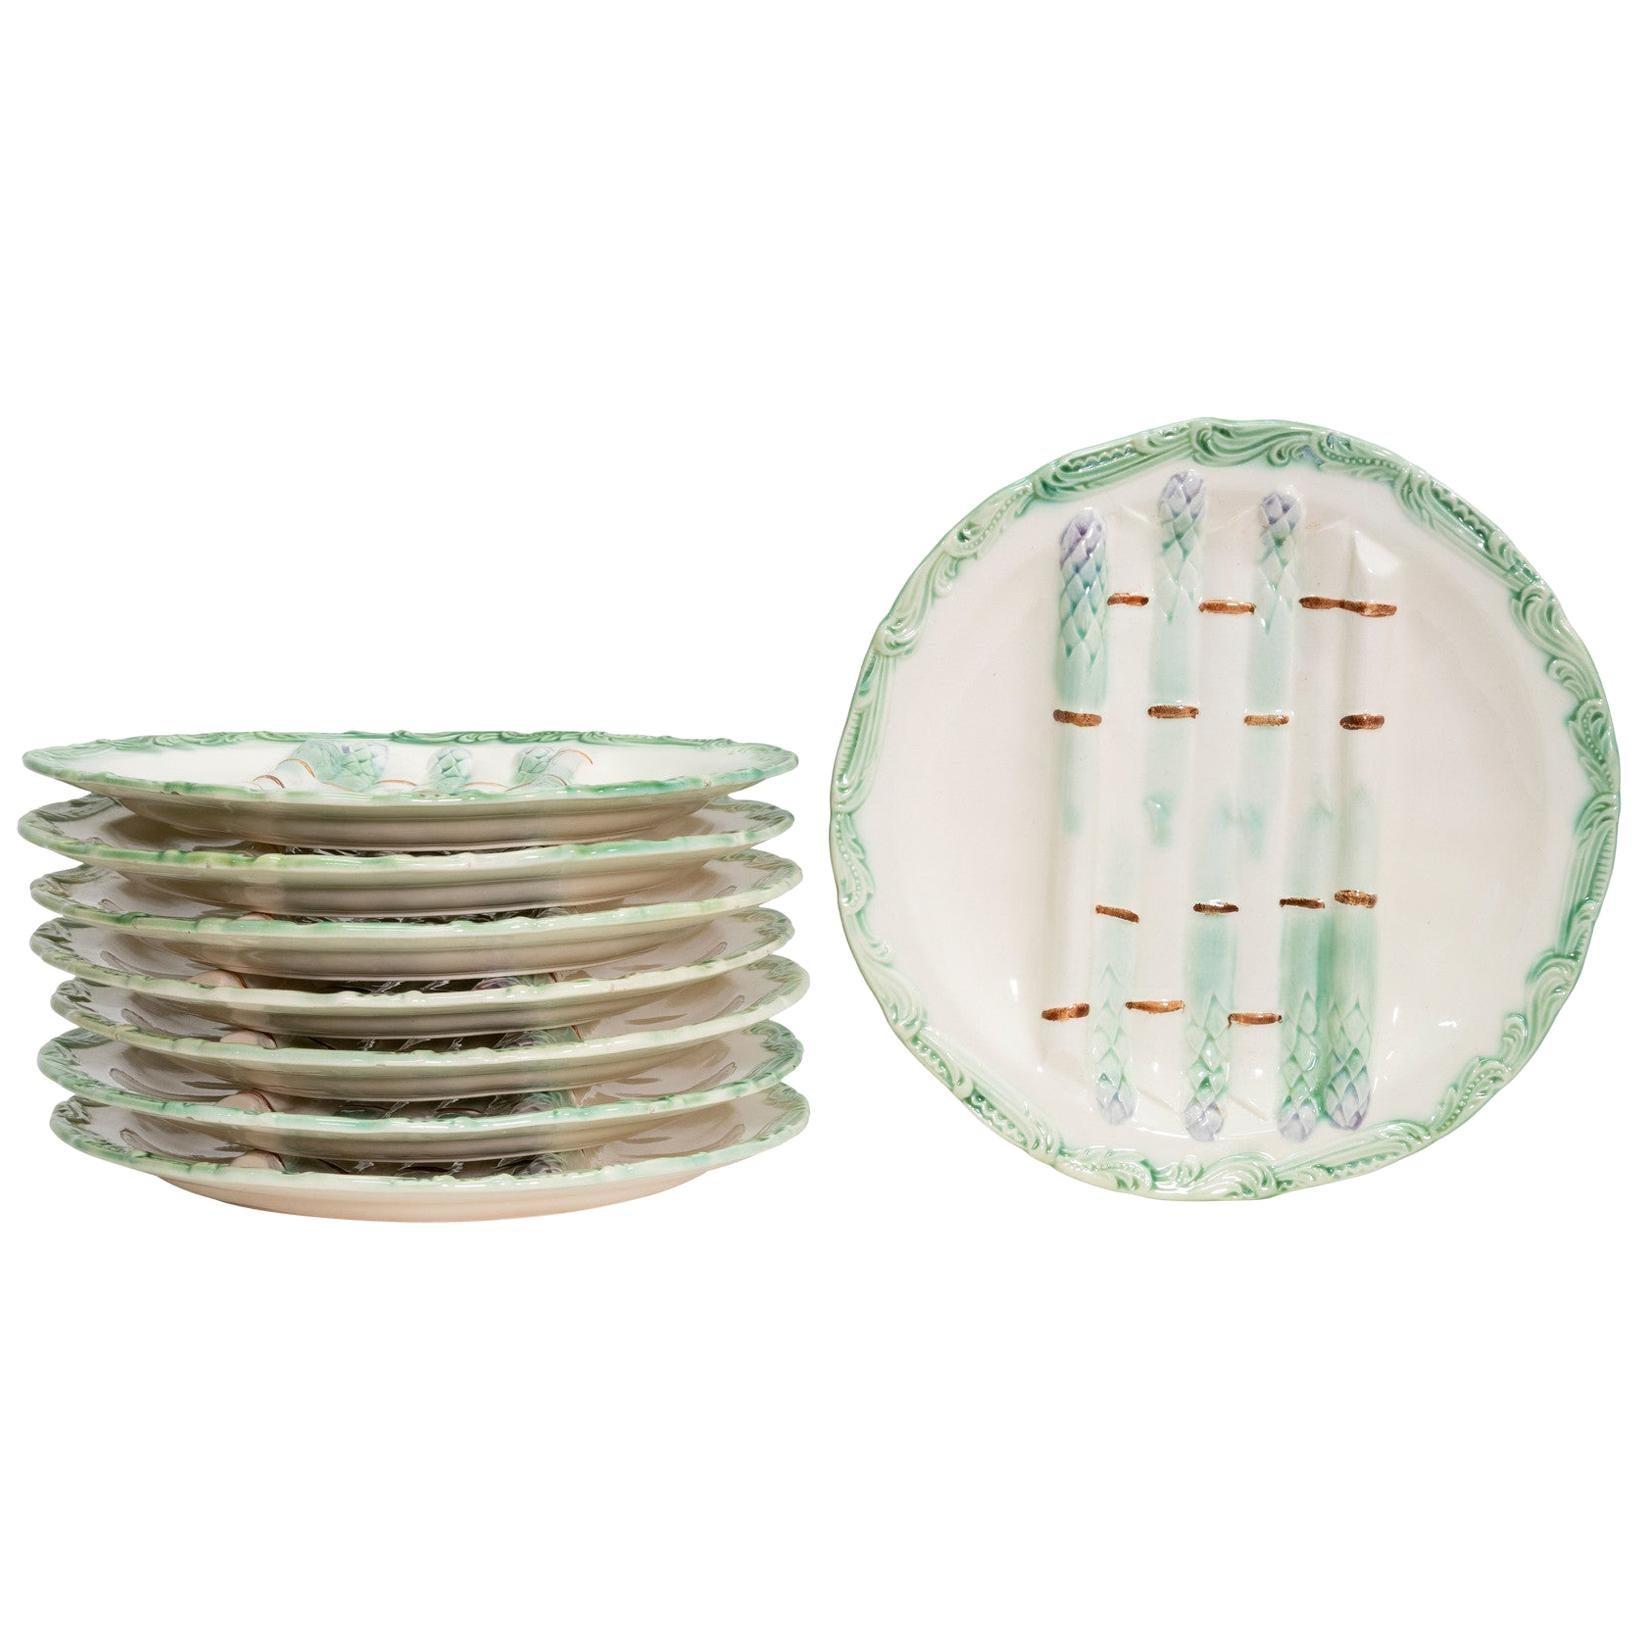 French Majolica Asparagus Plates, Set of 8